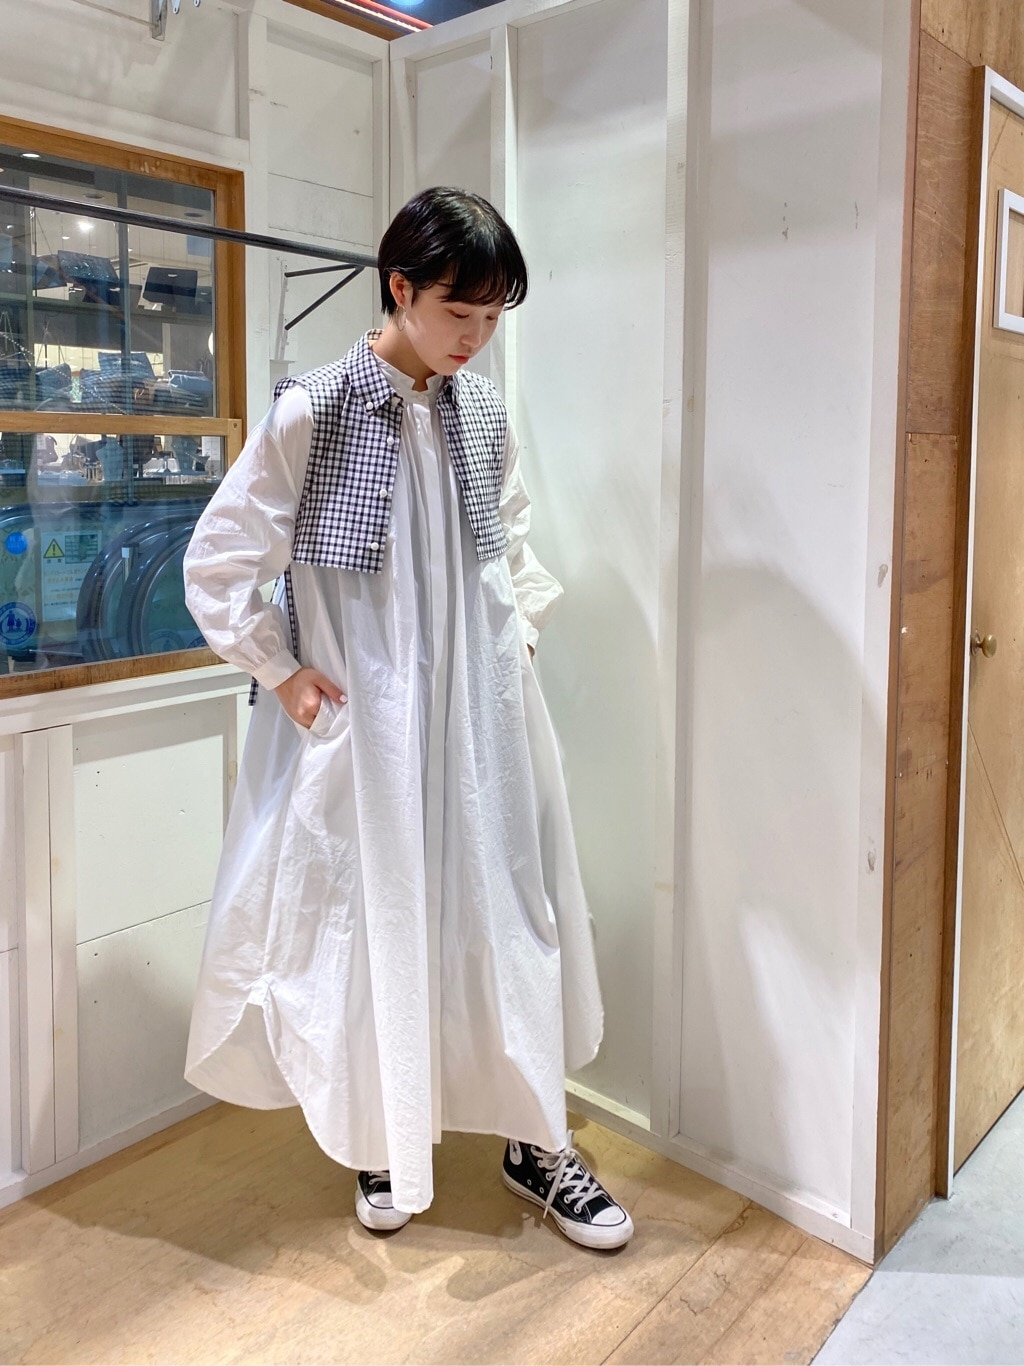 l'atelier du savon 新宿ミロード 身長:159cm 2020.09.12